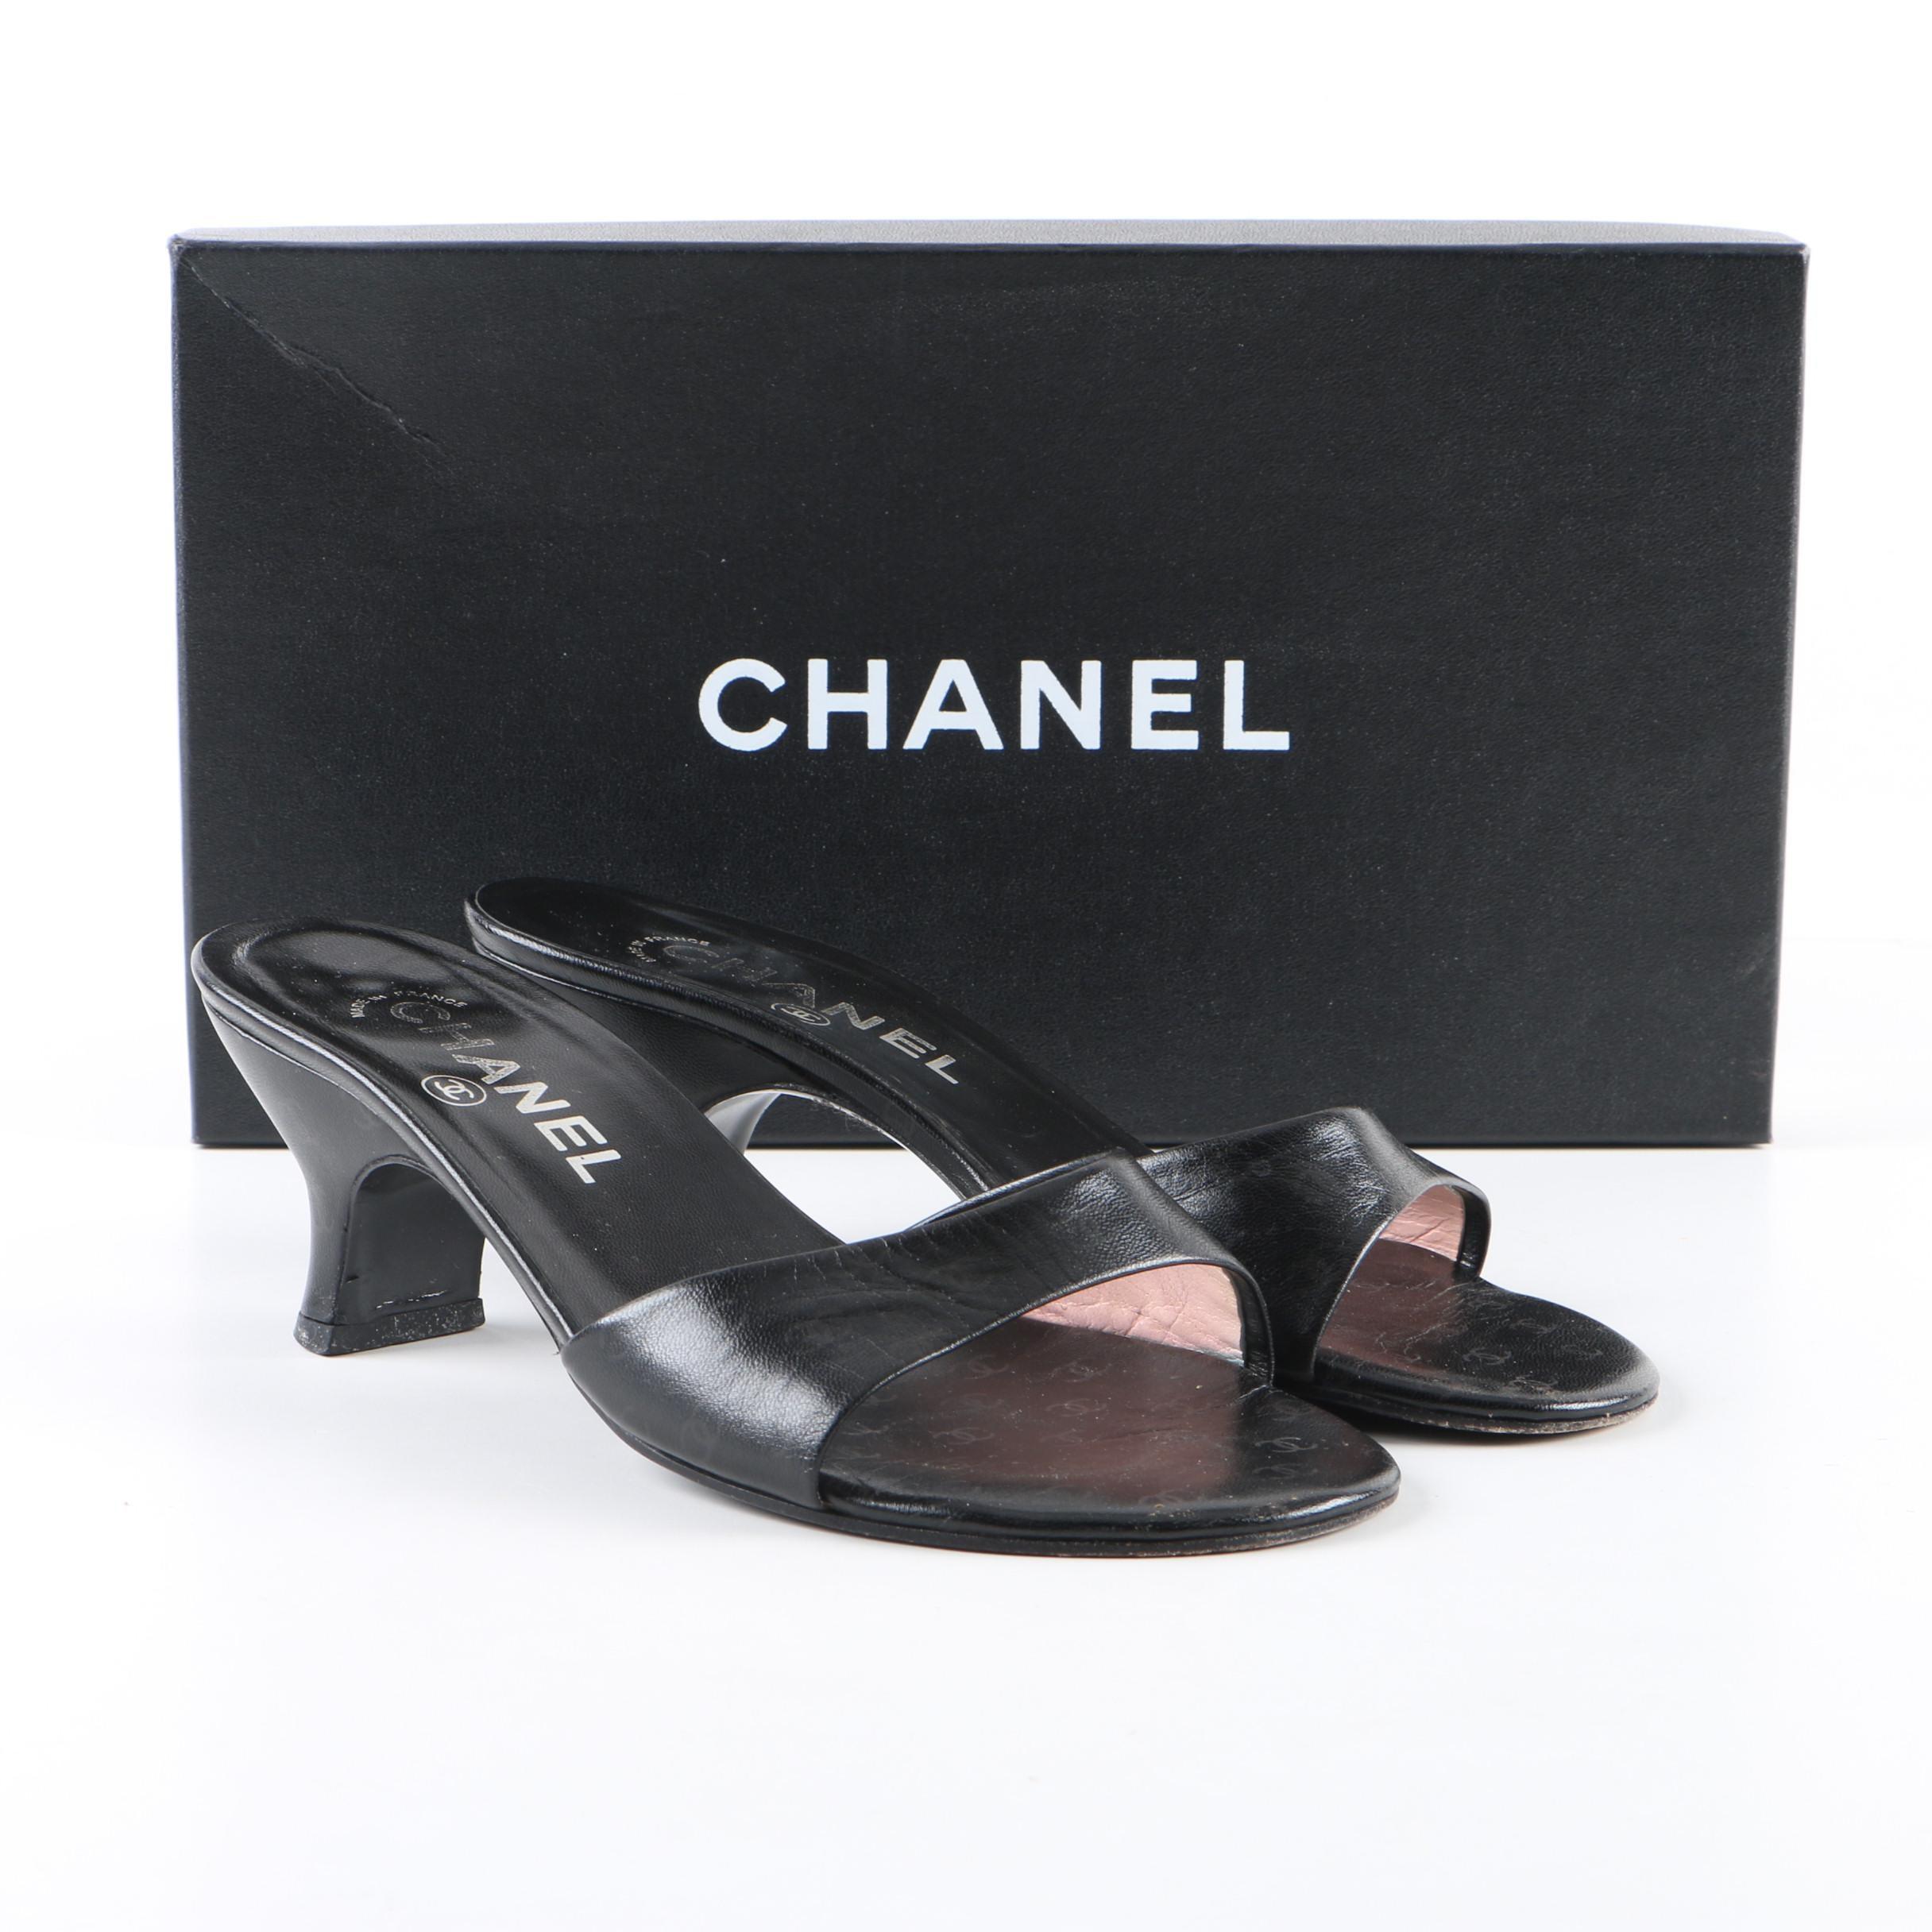 Women's Chanel Black Leather High-Heeled Slide Sandals